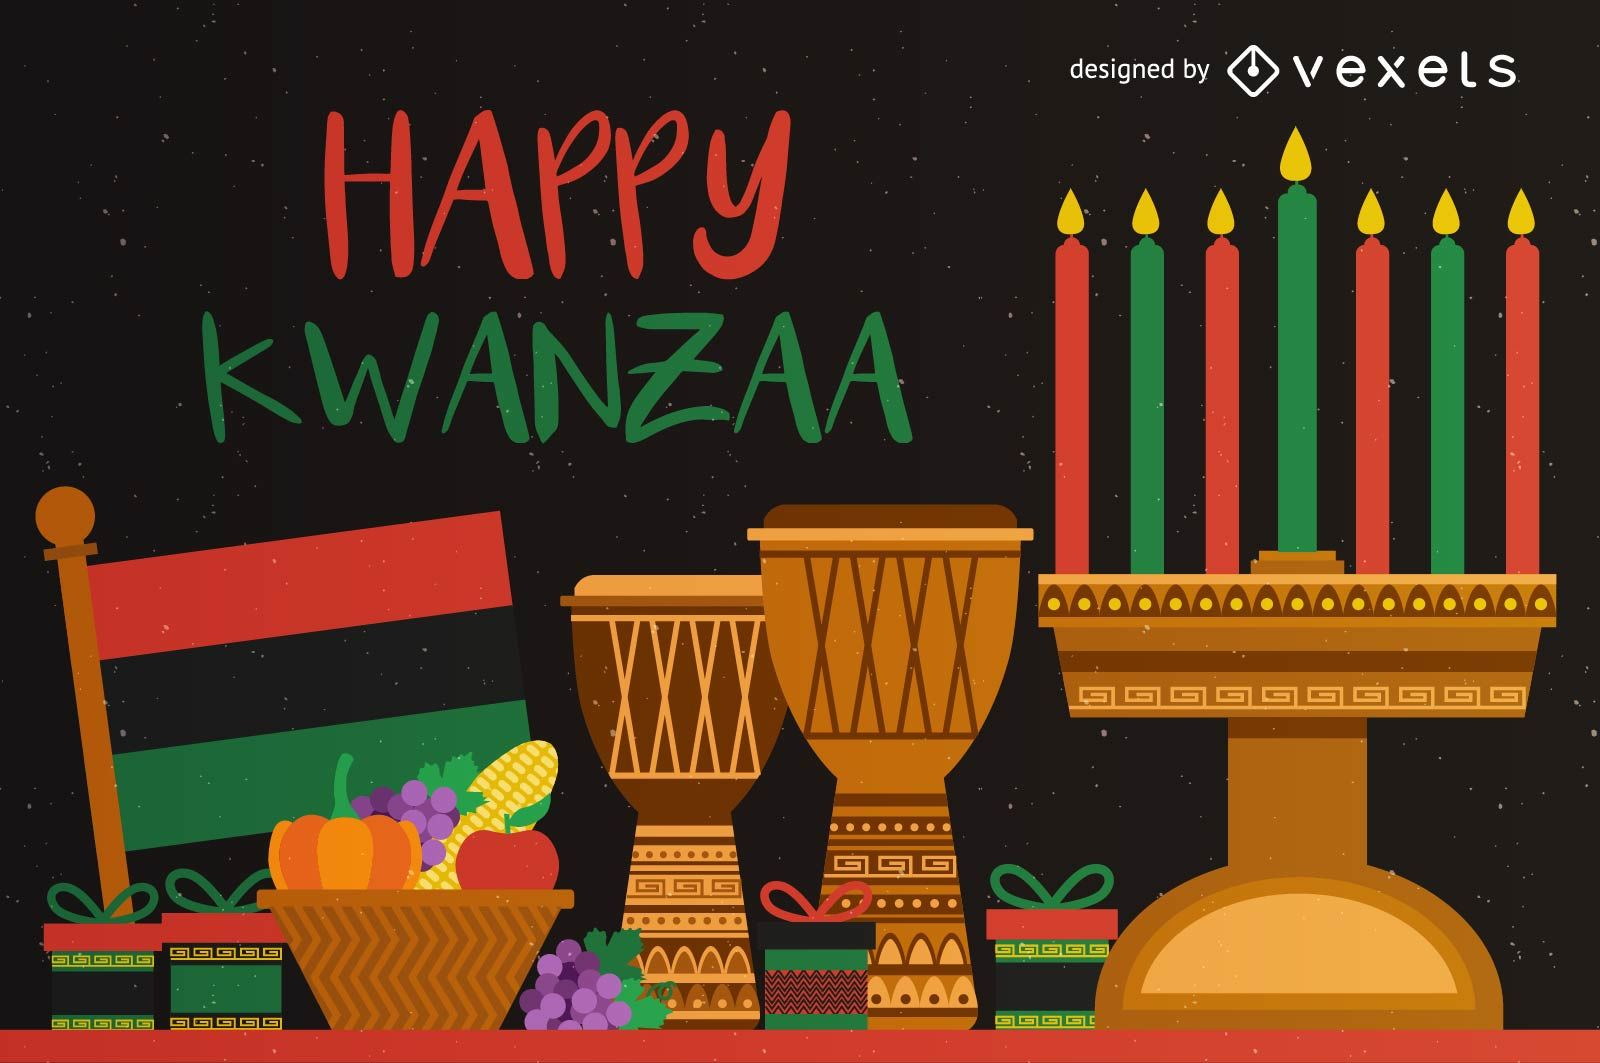 929b6d98f35962ed743926197bfee0cc-colorful-happy-kwanzaa-greeting-card.jpg